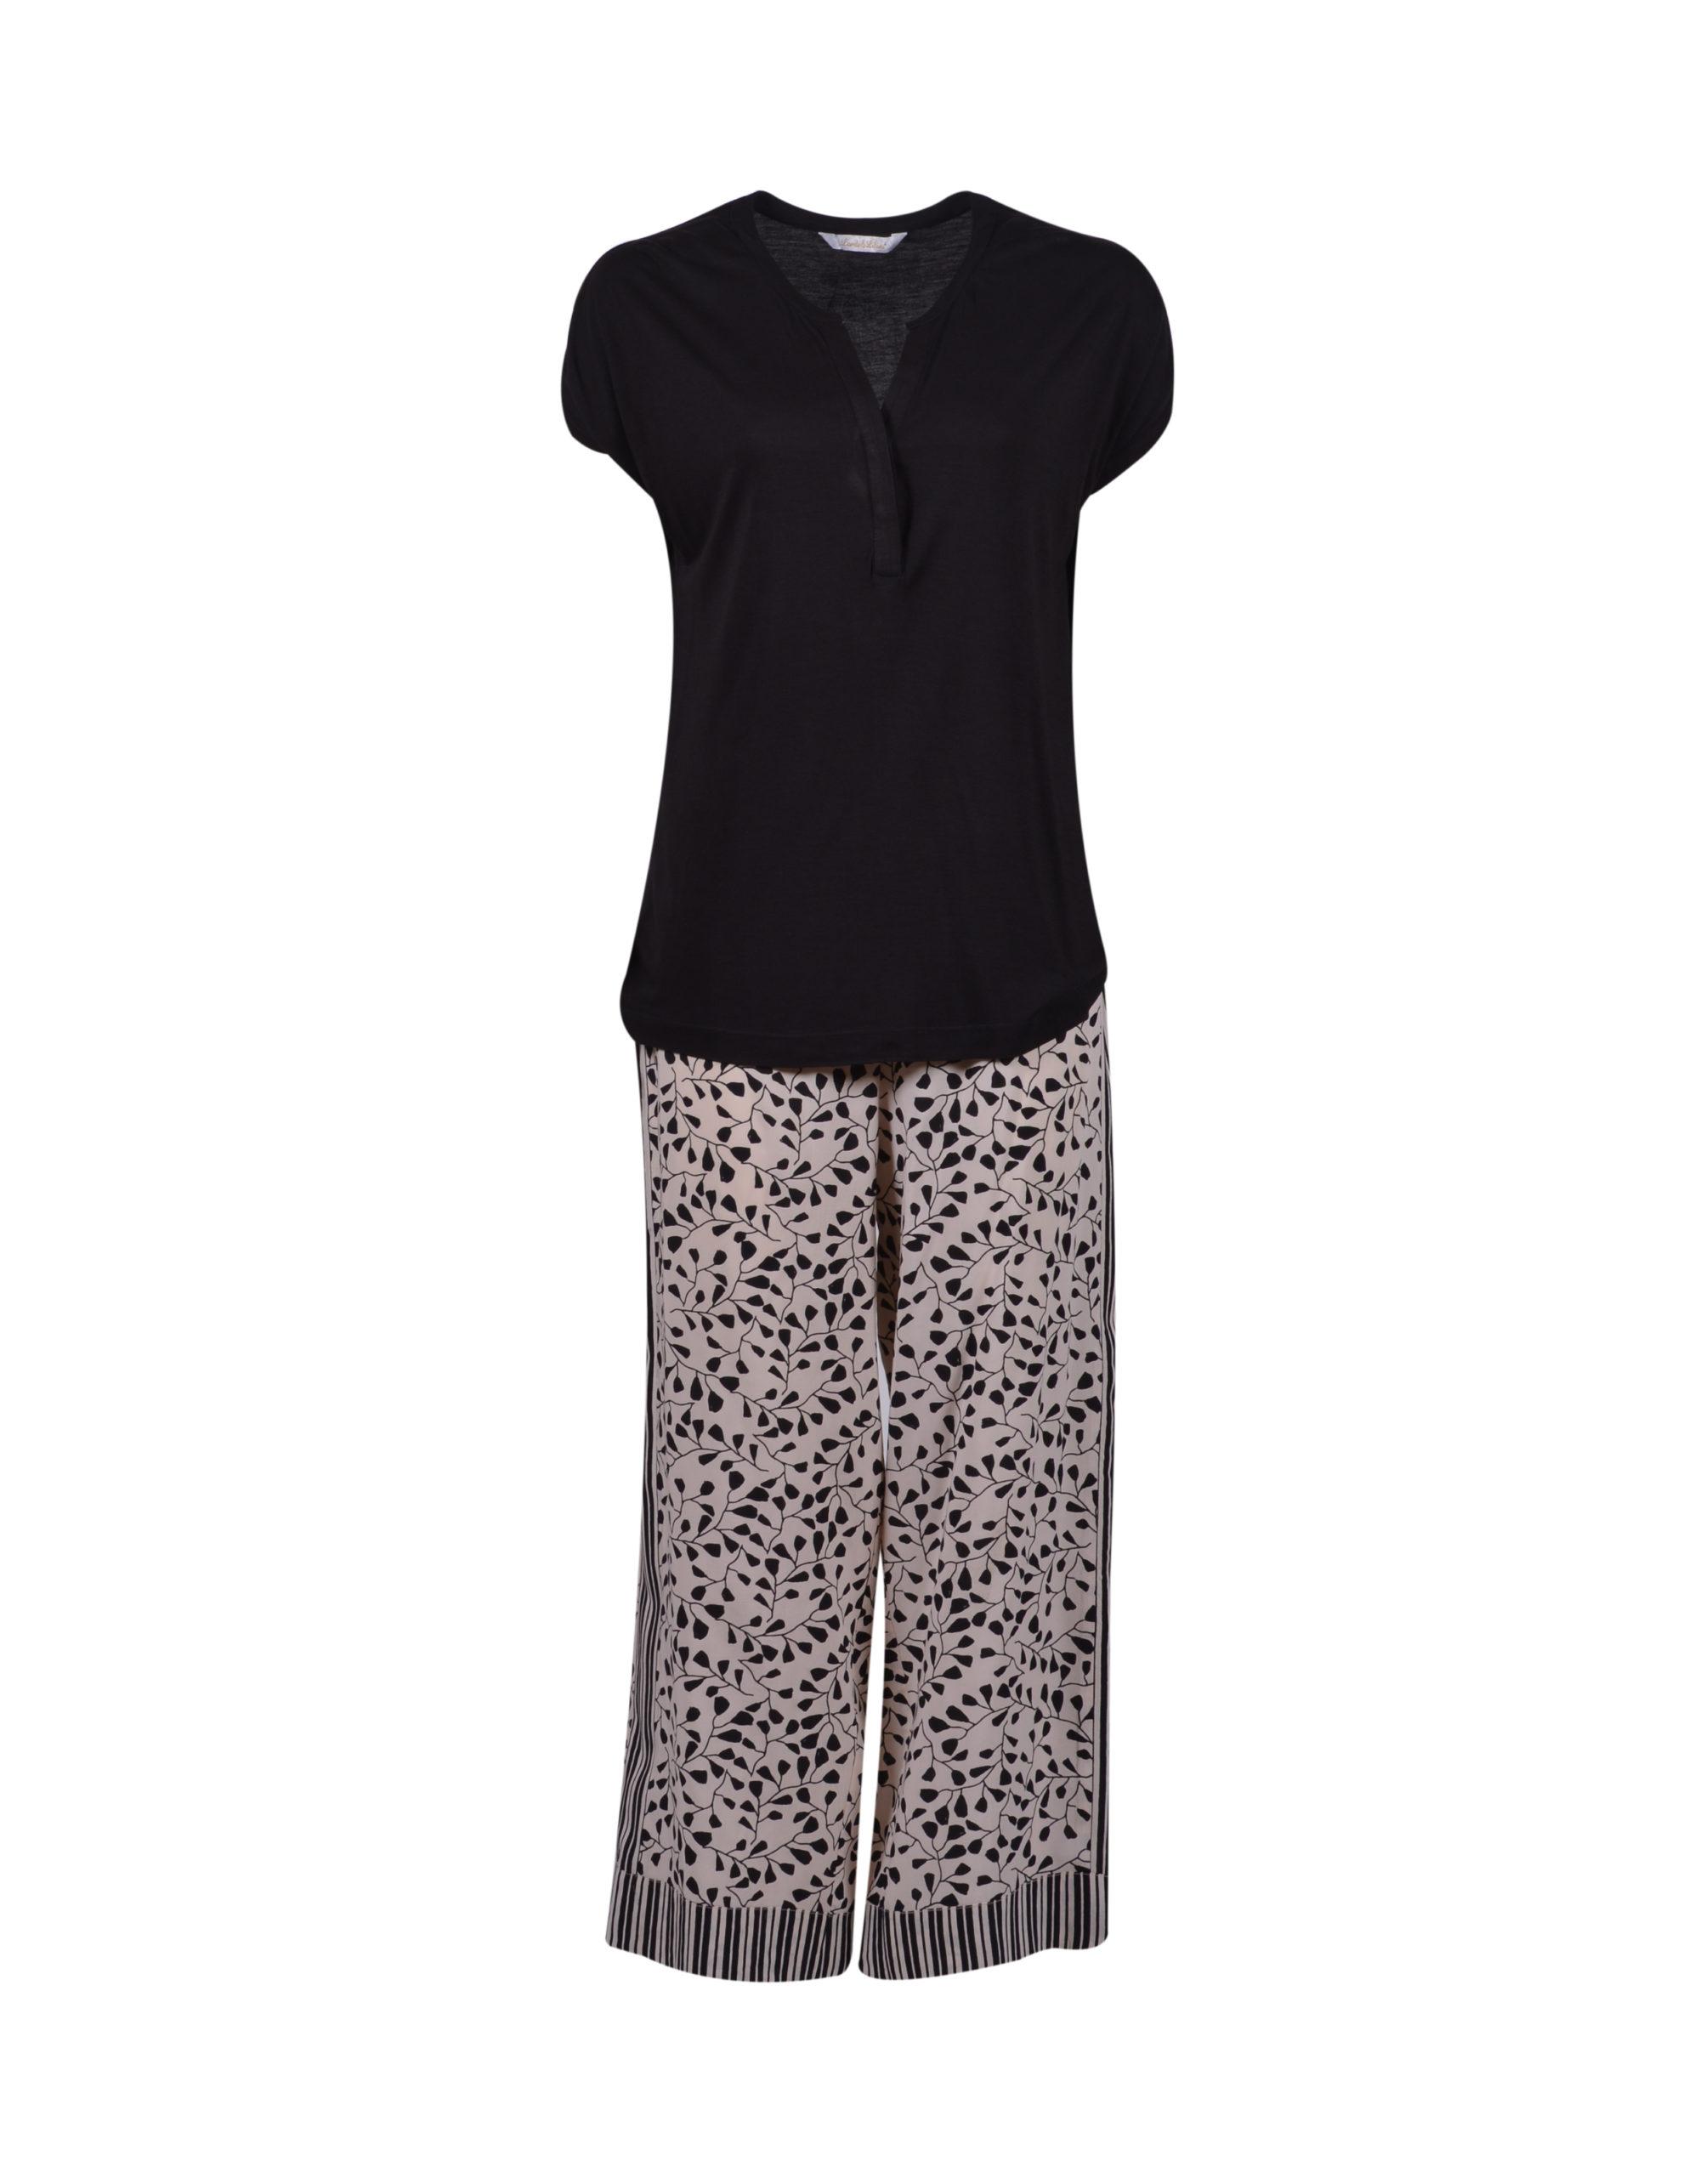 LORDS & LILIES Dames pyjama, antraciet